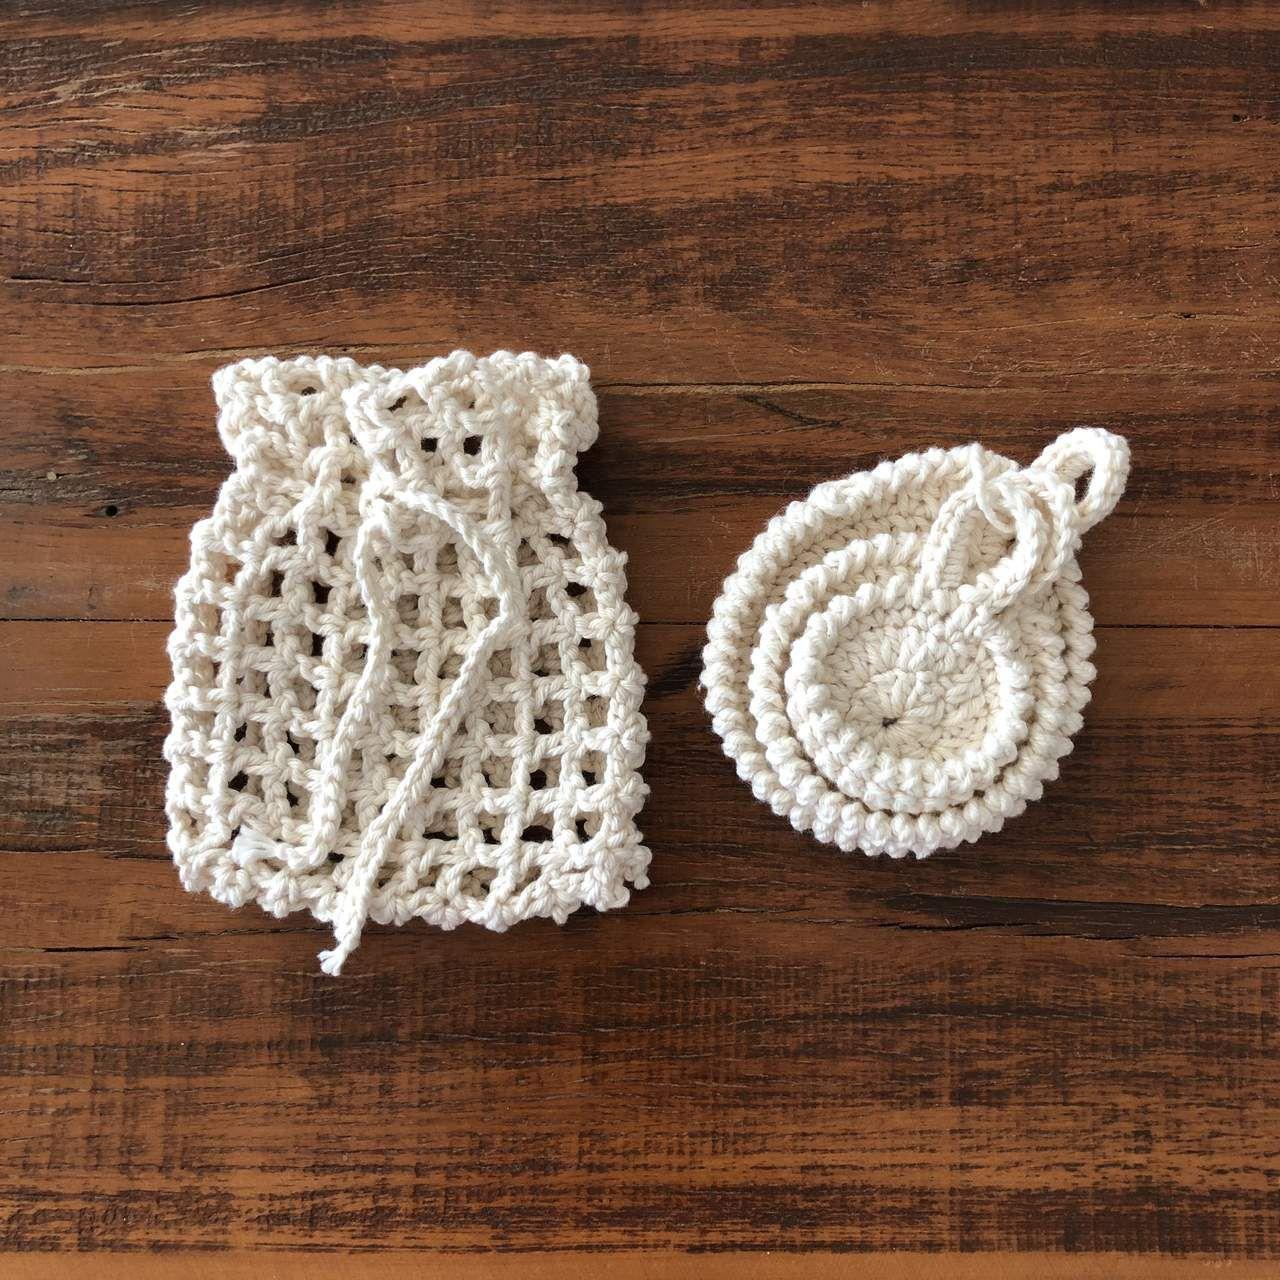 Kit 3 ecopads + sacolinha de crochê cor creme